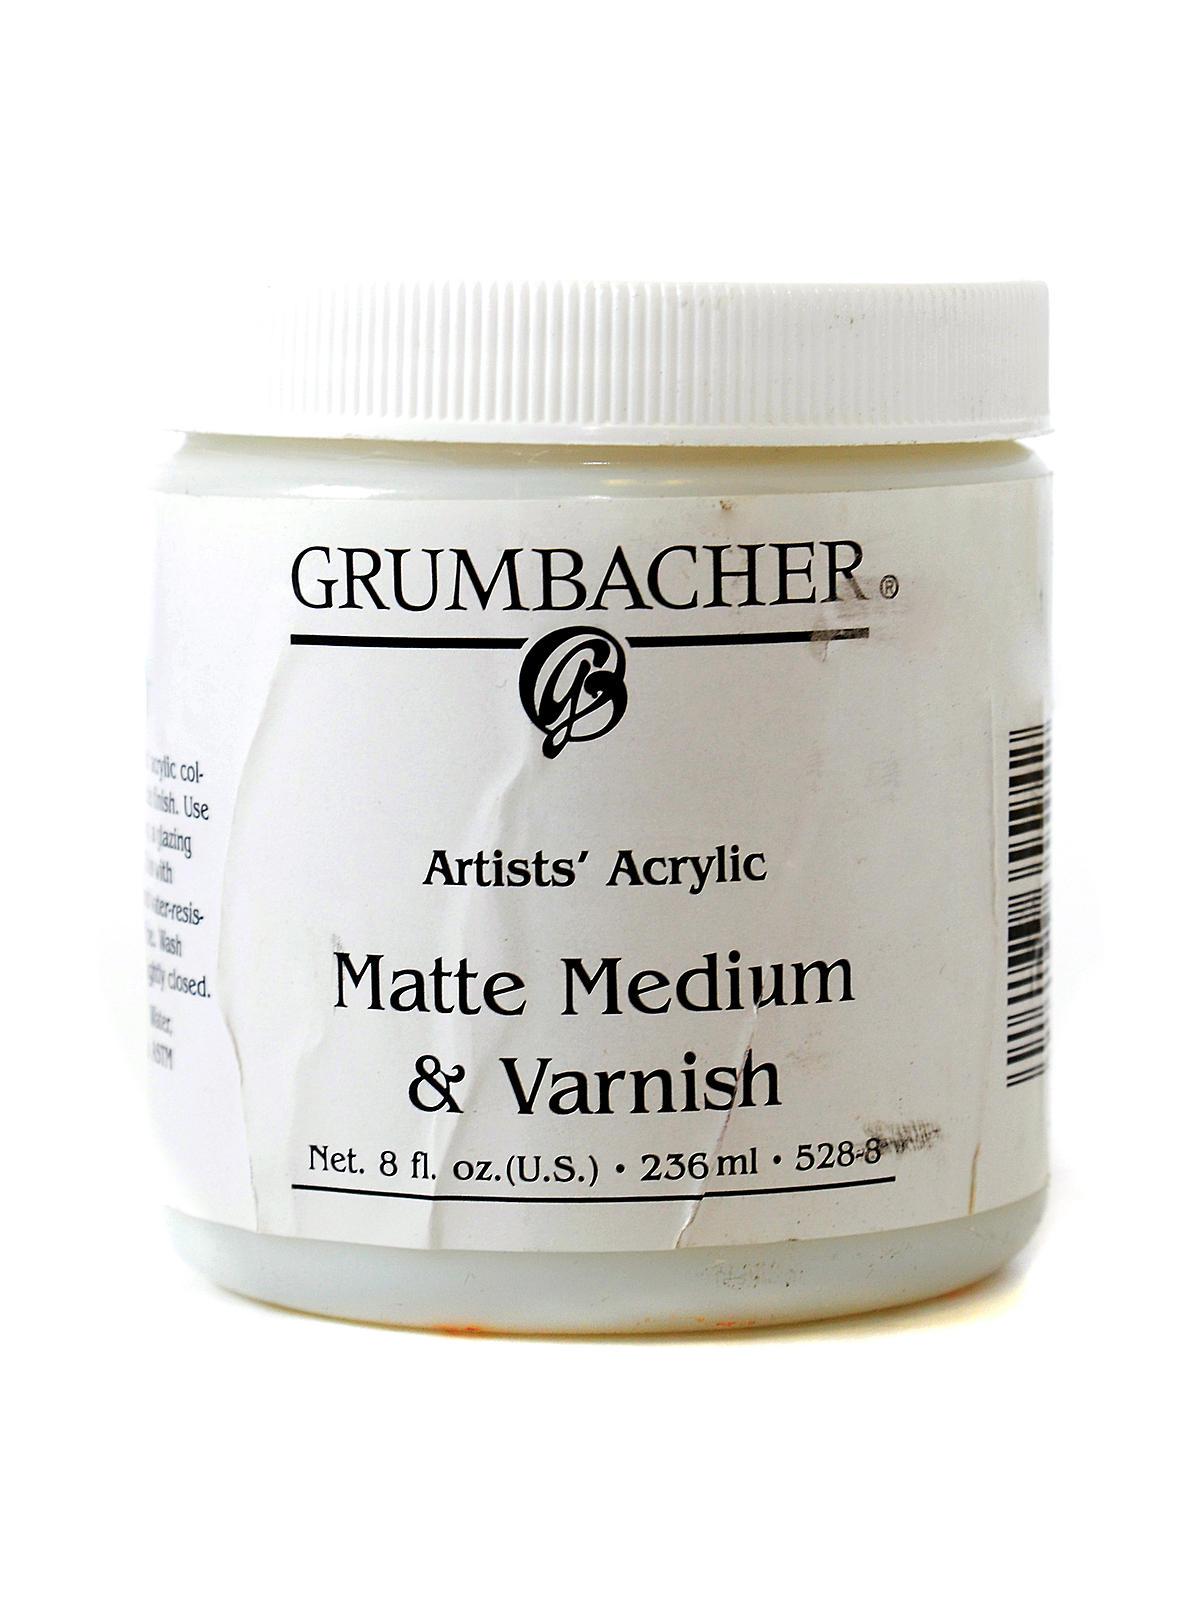 Artists' Acrylic Matte Medium & Varnish